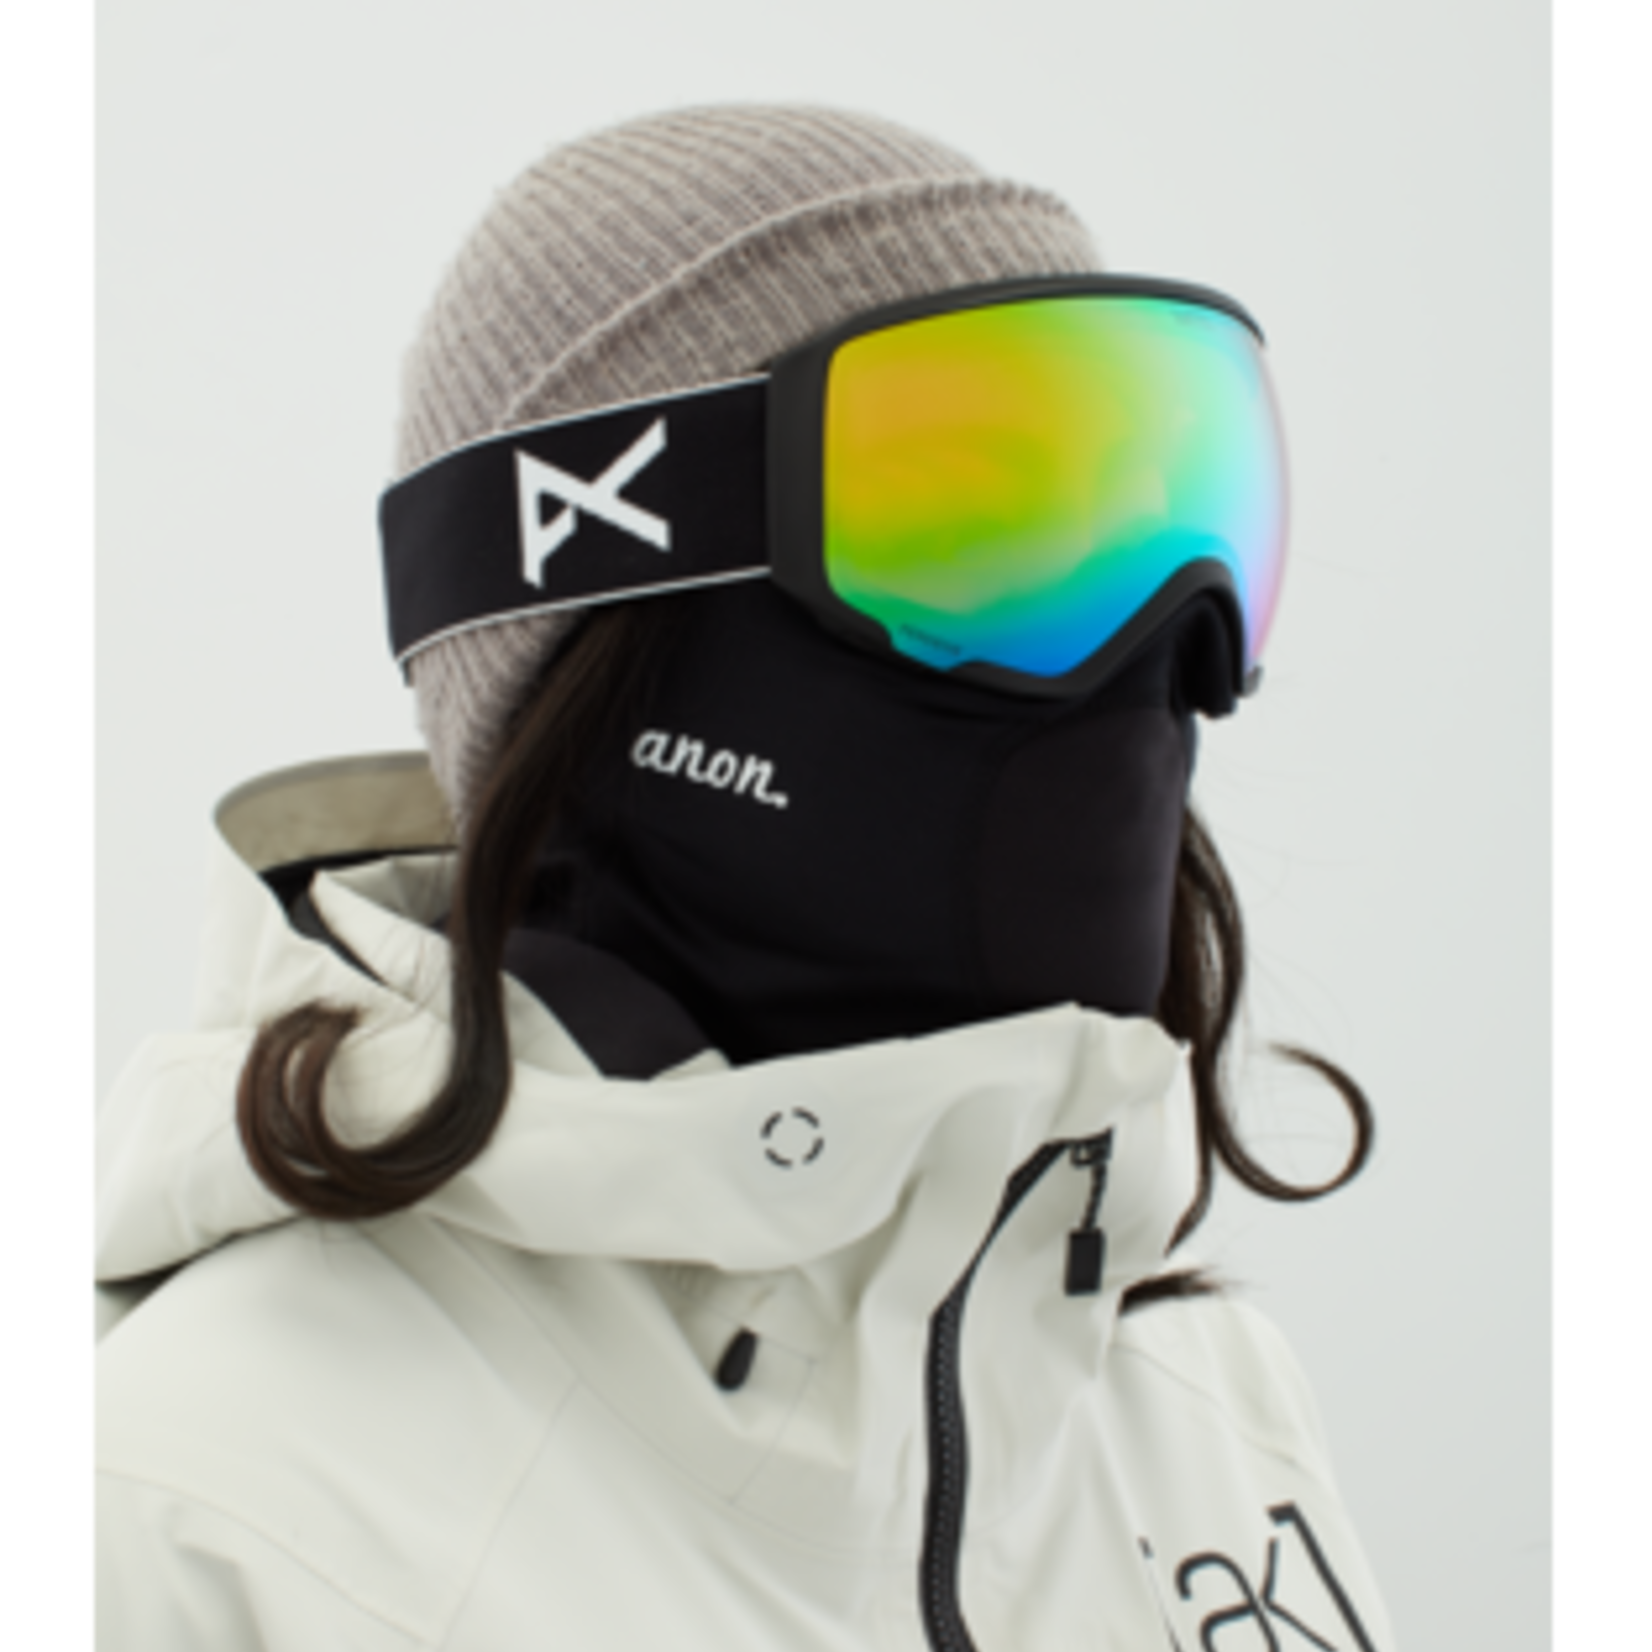 Anon Anon WM1 Goggles + Bonus Lens + MFI® Face Mask